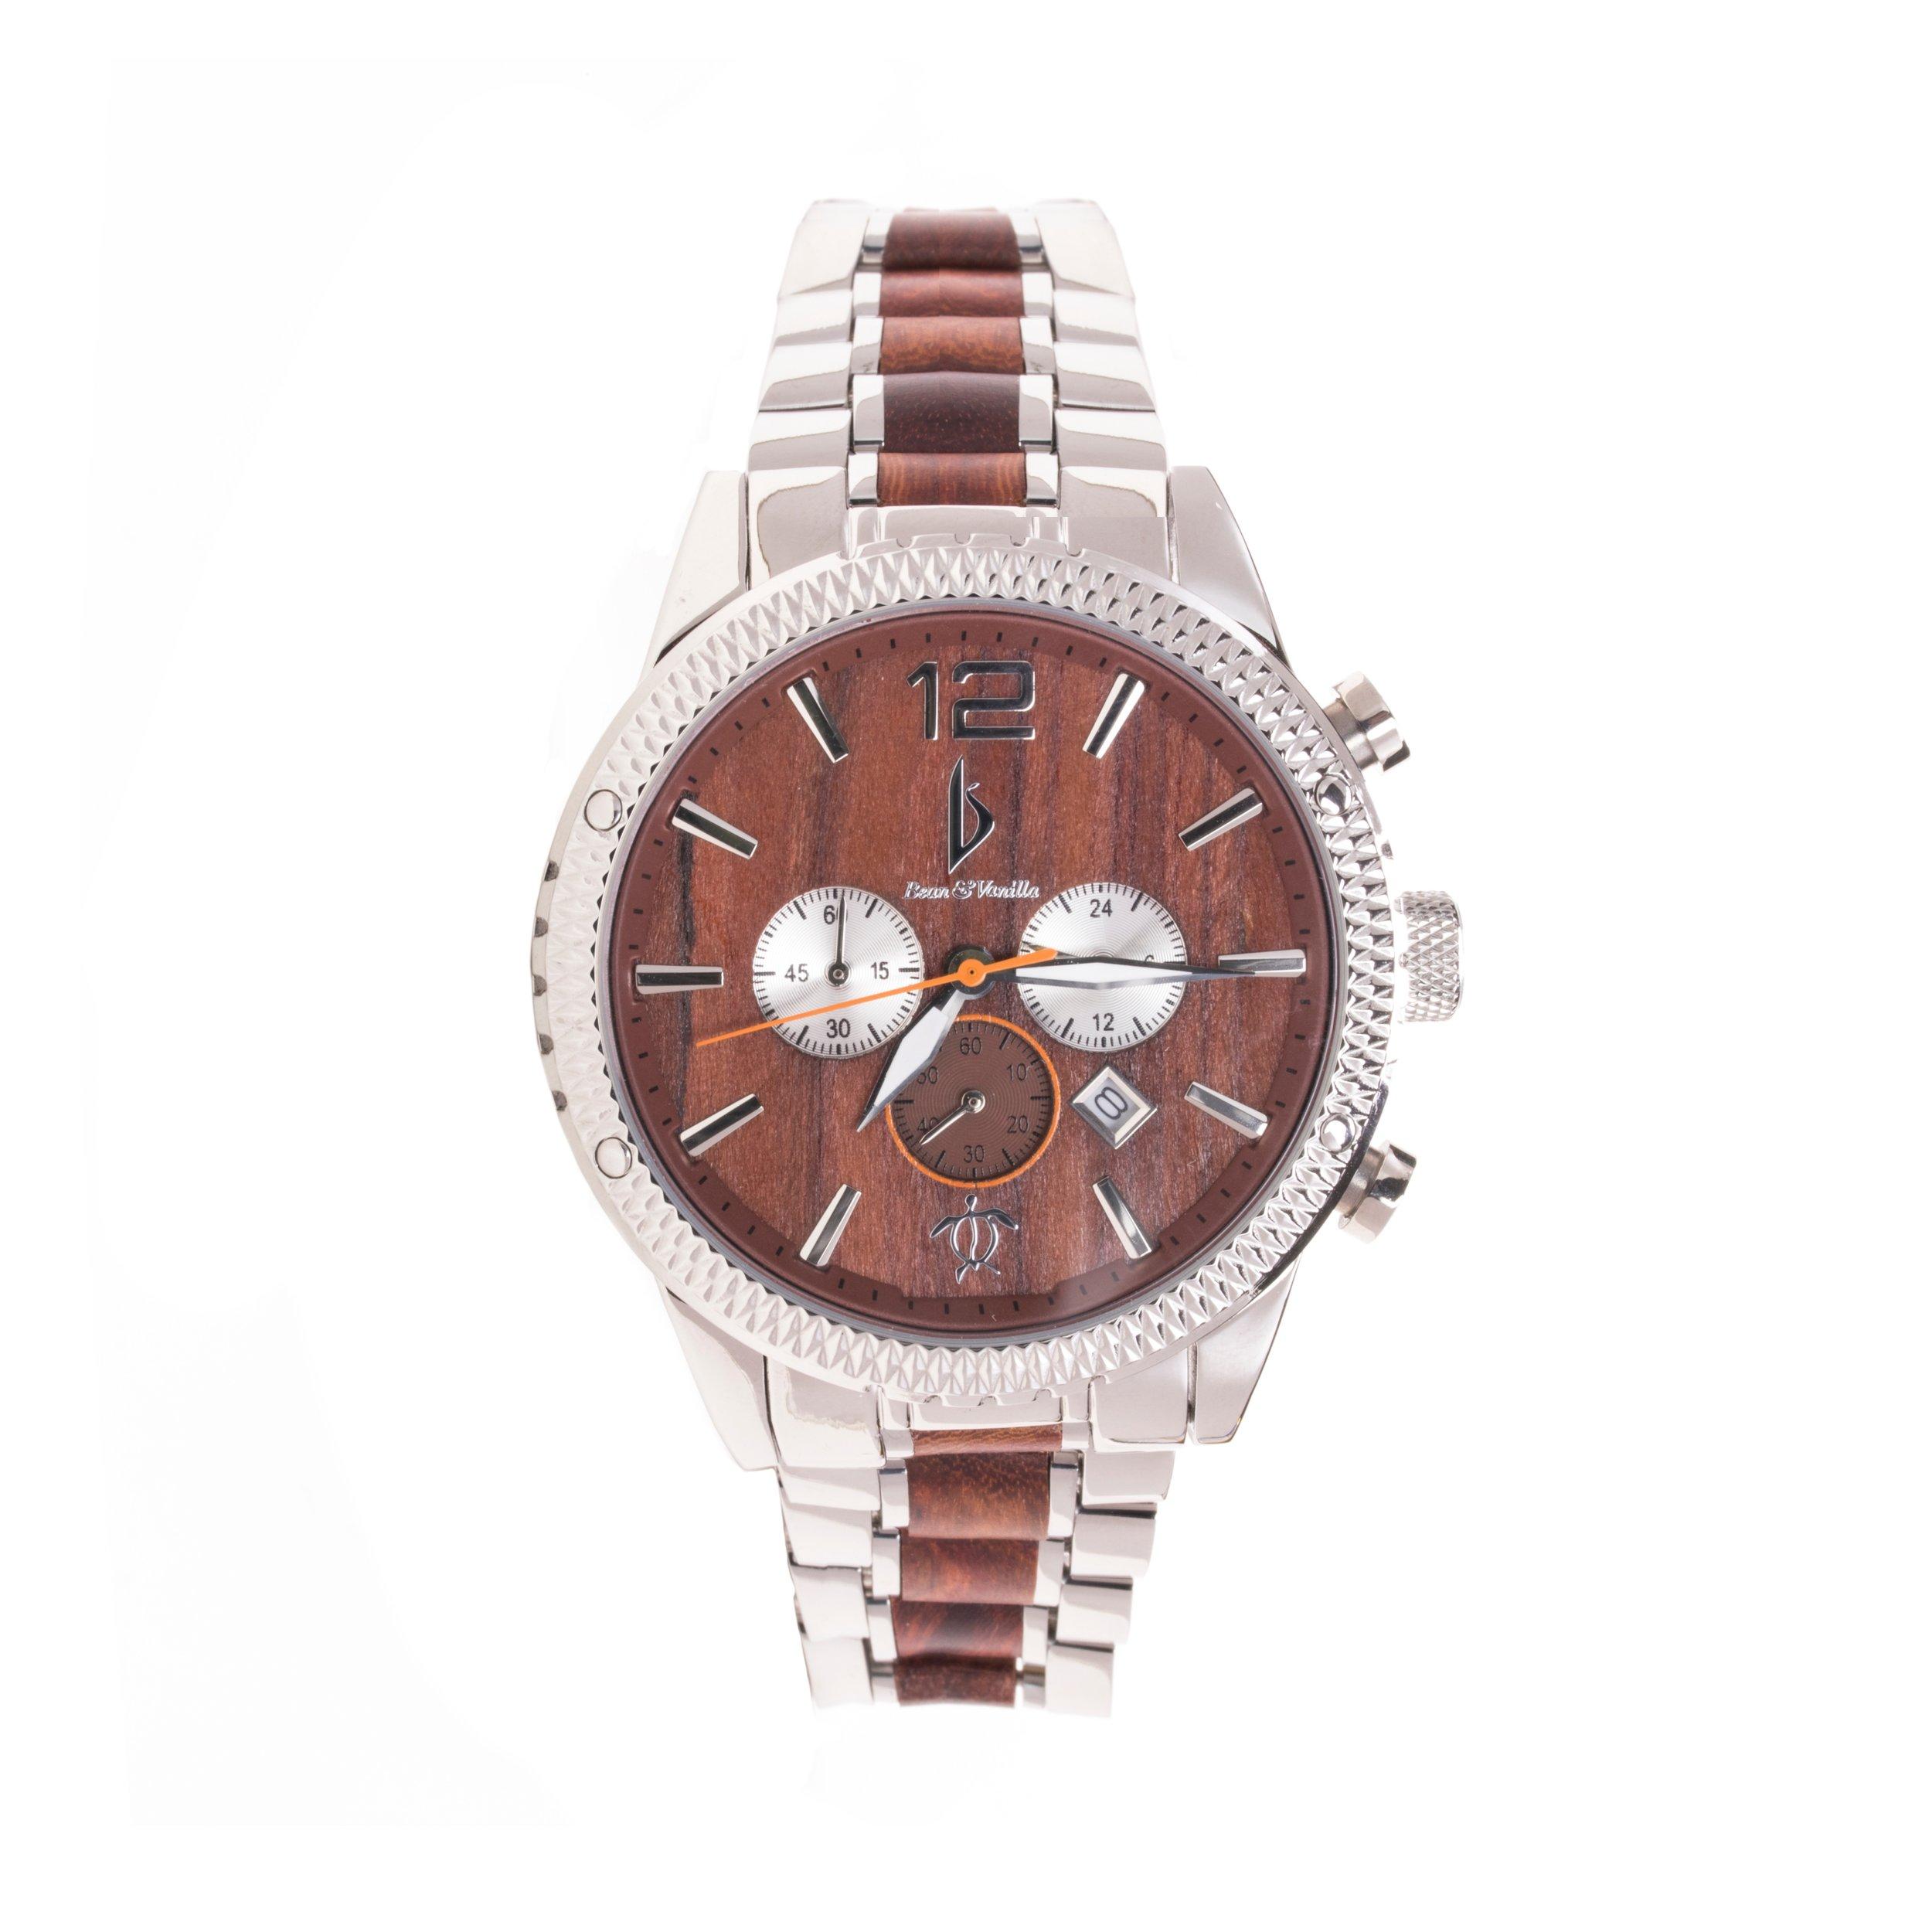 Chronograph - Steel and Sandalwood Watch